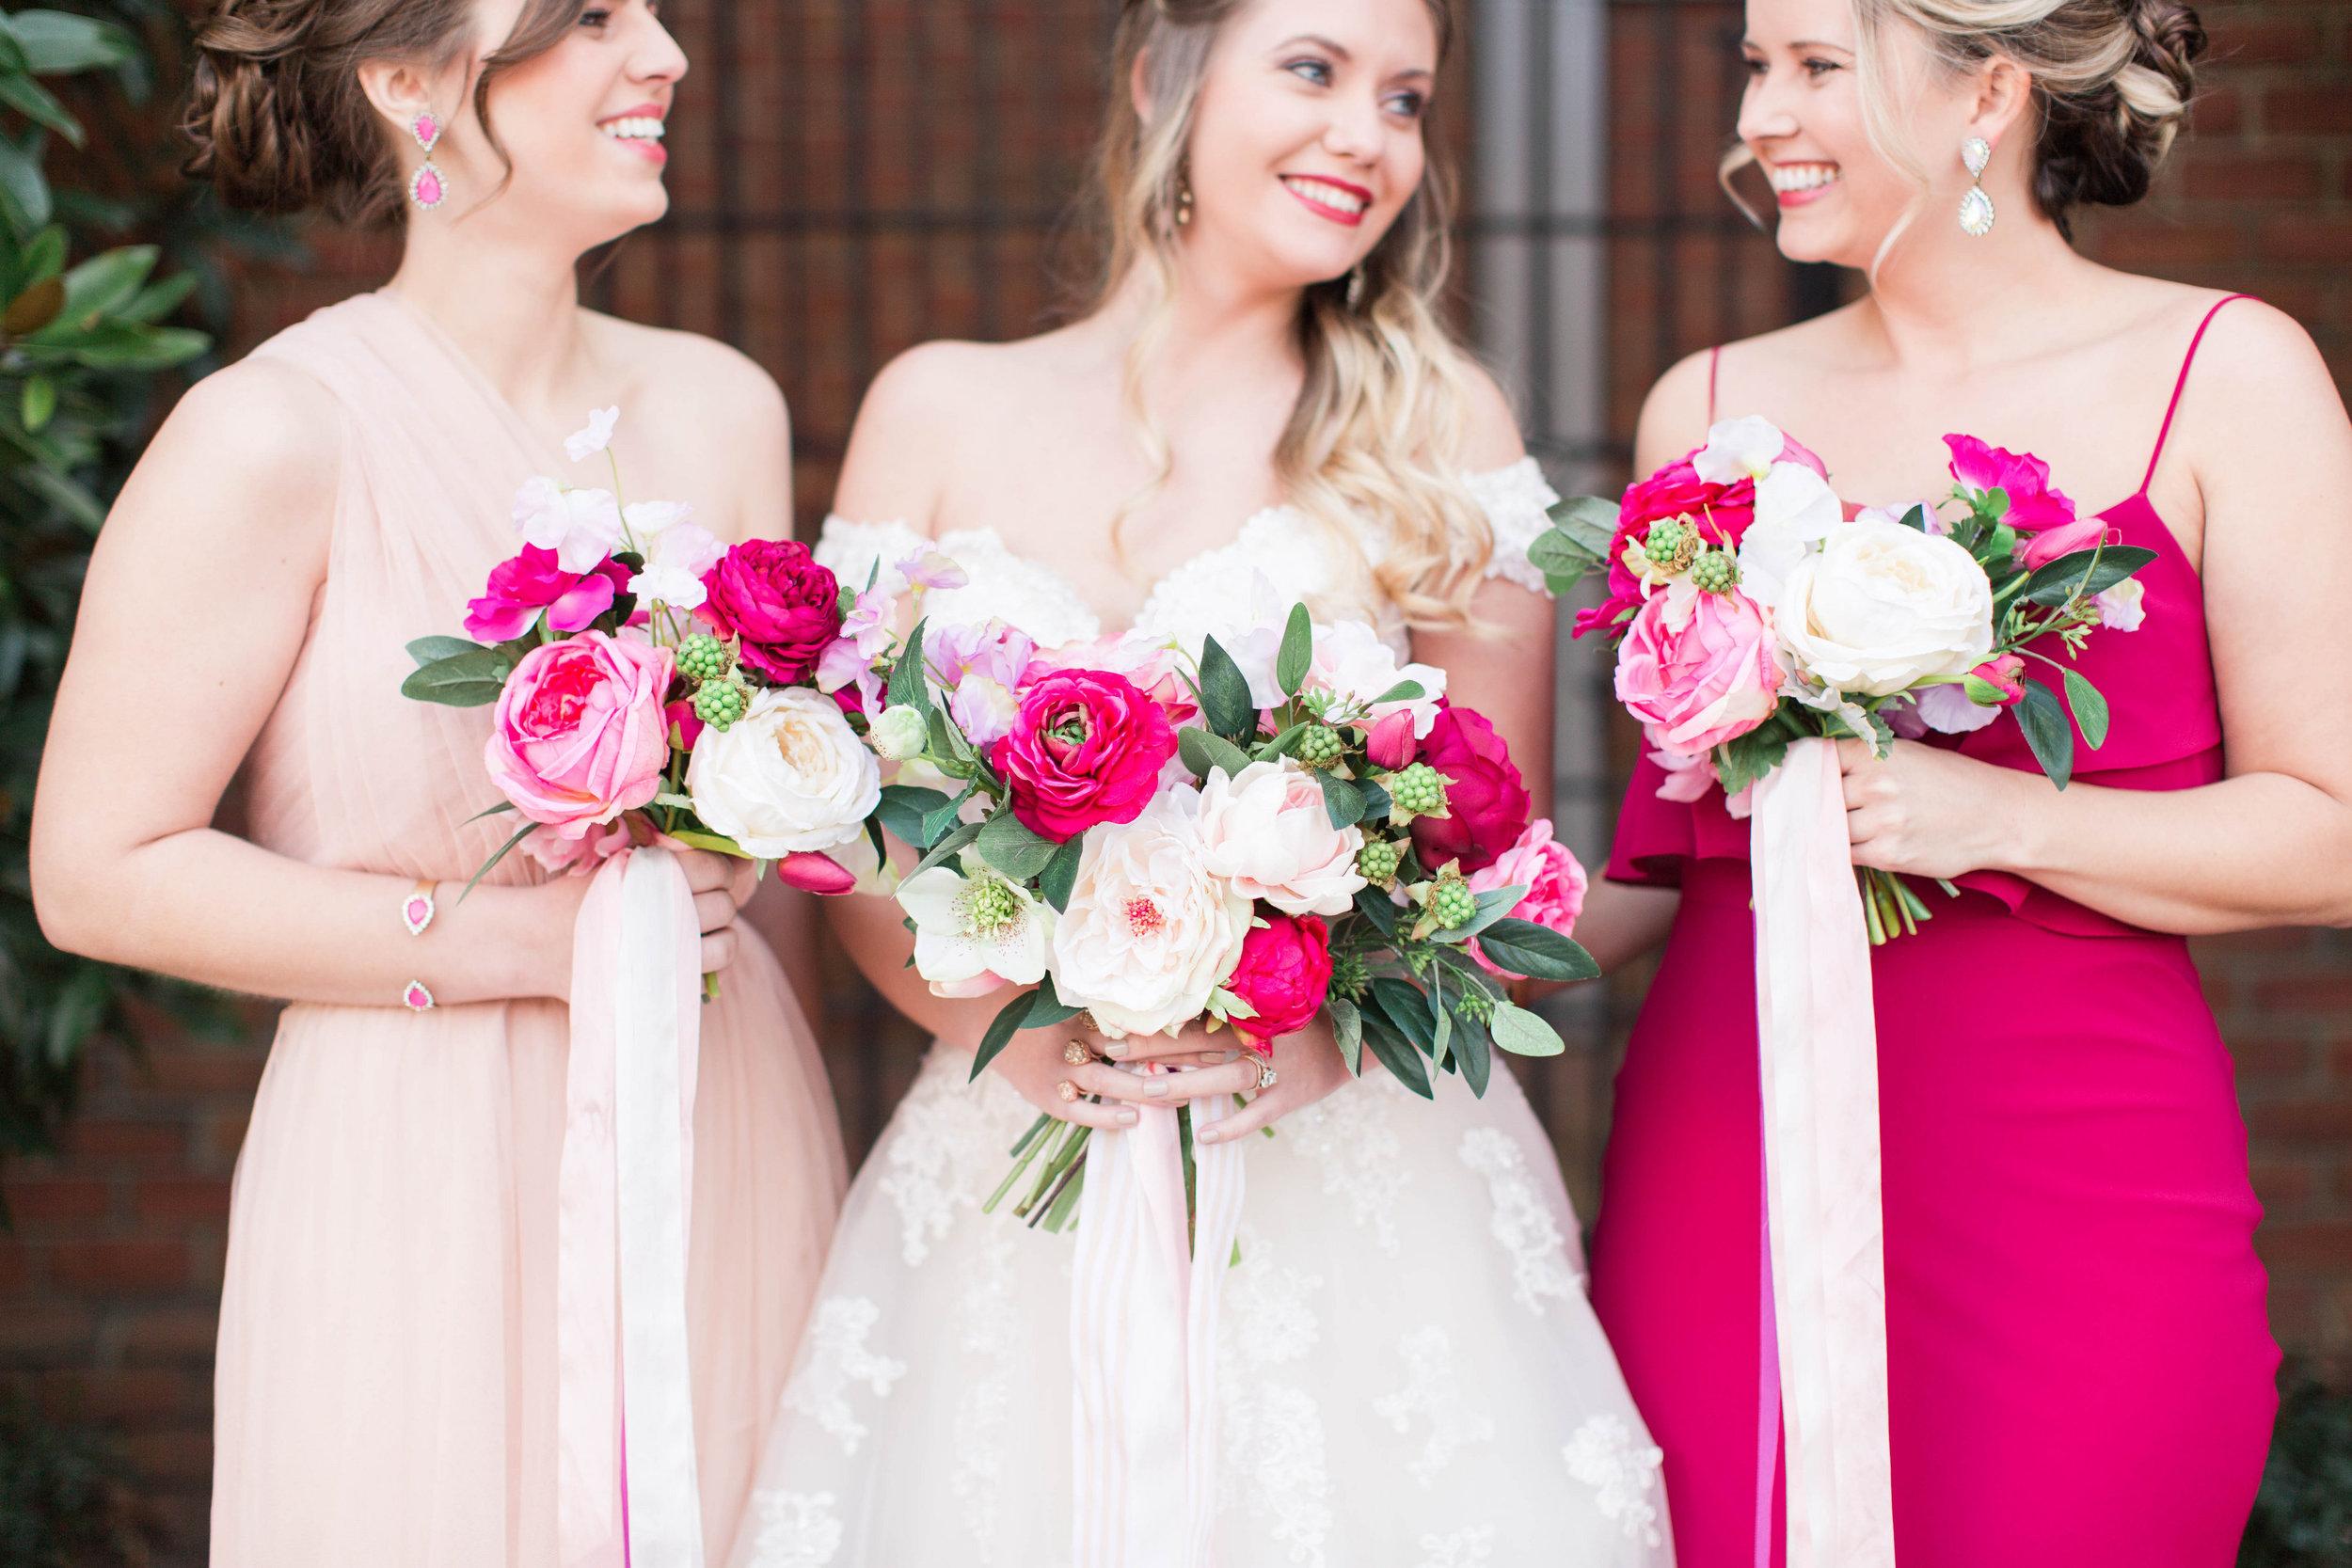 afloral-fake-flower-wedding-ivory-and-beau-bridal-boutique-maggie-sottero-saffron-the-hall-on-vine-wedding-statesboro-wedding-savannah-wedding-kristian-designs-rachel-strickland-photography-savannah-bridal-southern-bride-savannah-bride-6.jpg